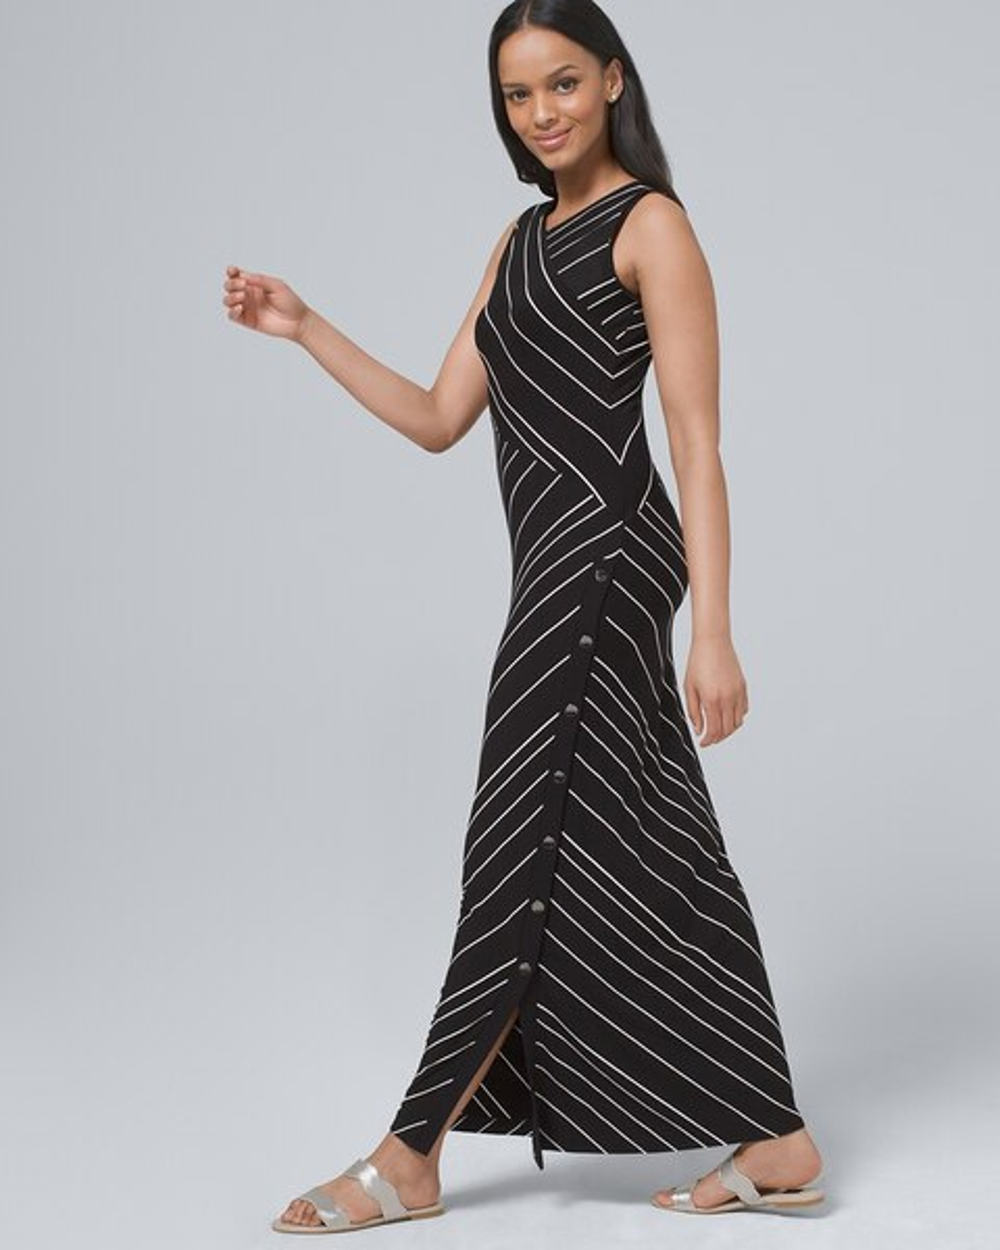 cec34030160 Return to thumbnail image selection Polished Knit Stripe Maxi Dress